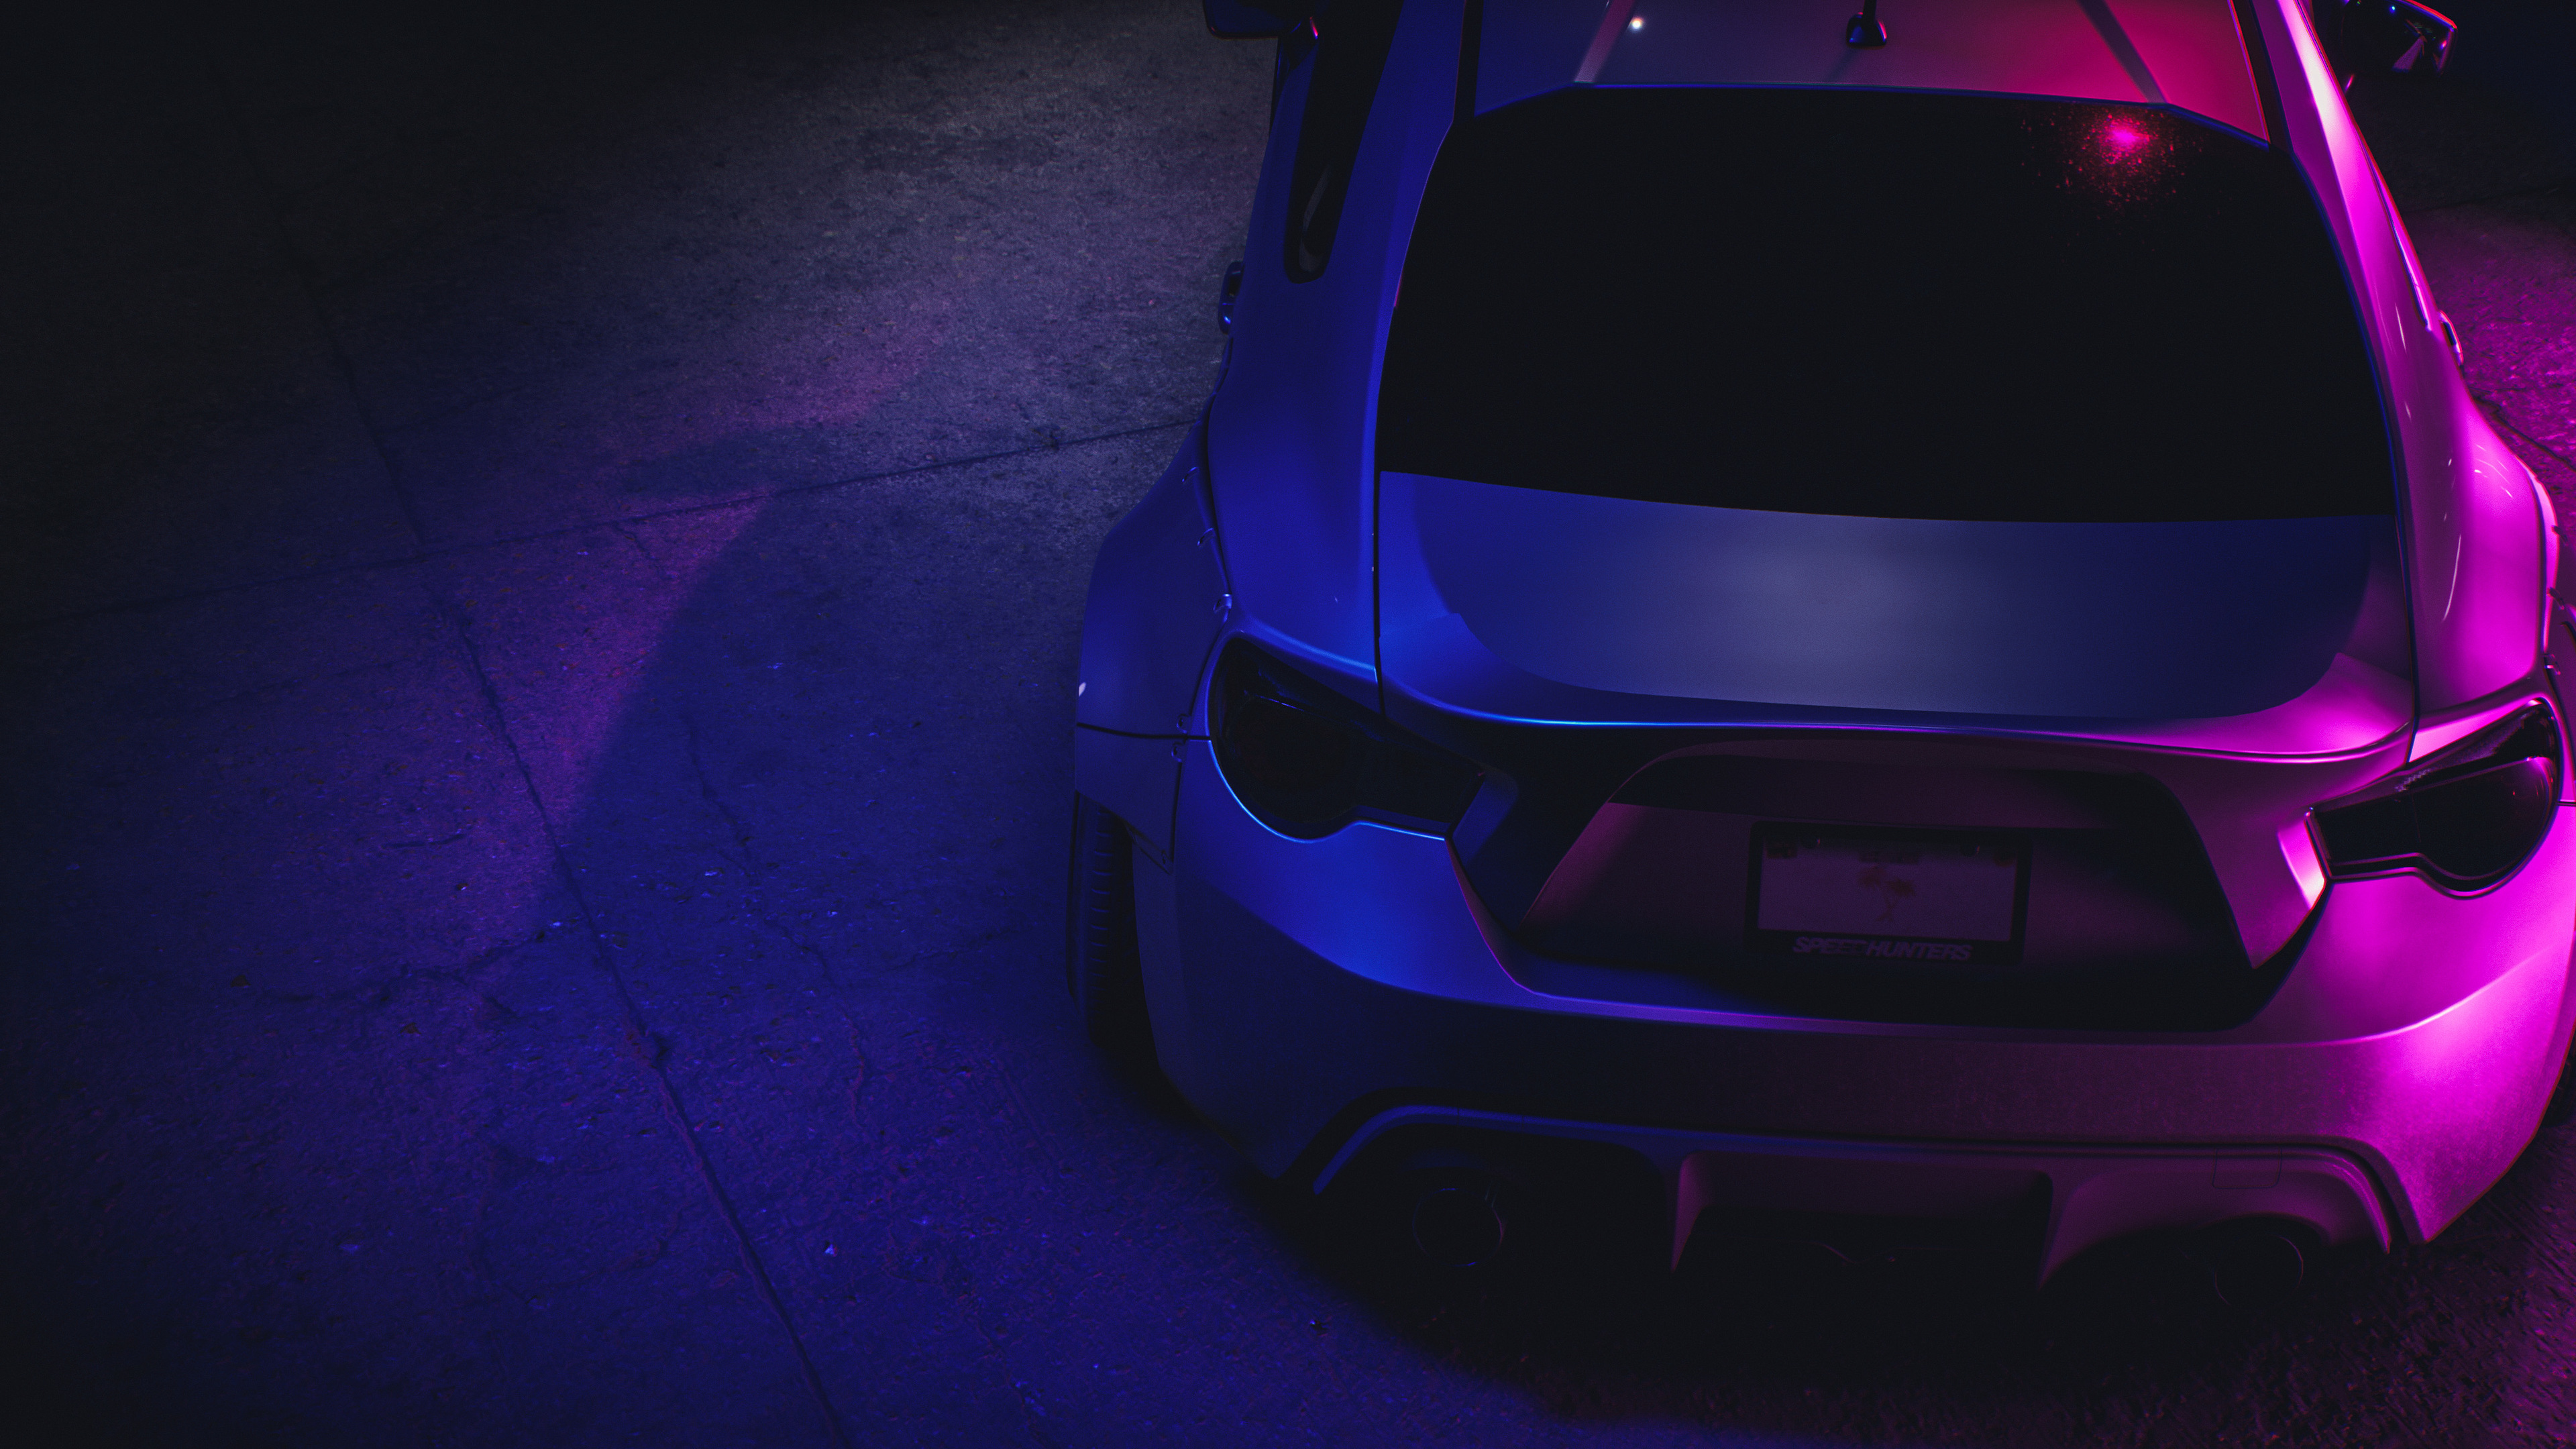 Neon Car Wallpaper 4k